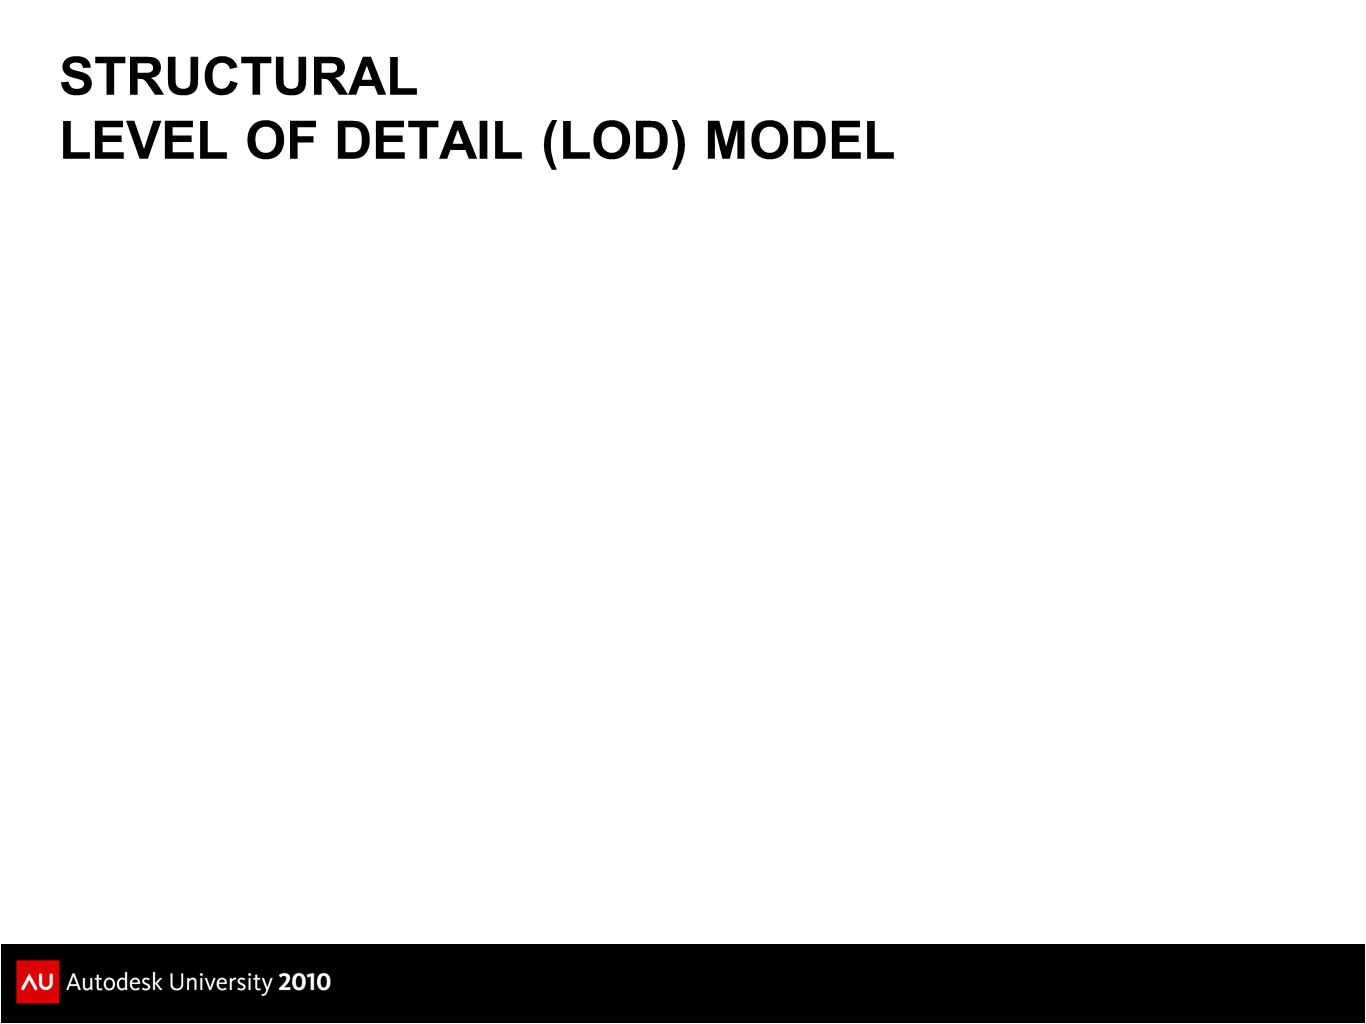 STRUCTURAL LEVEL OF DETAIL (LOD) MODEL